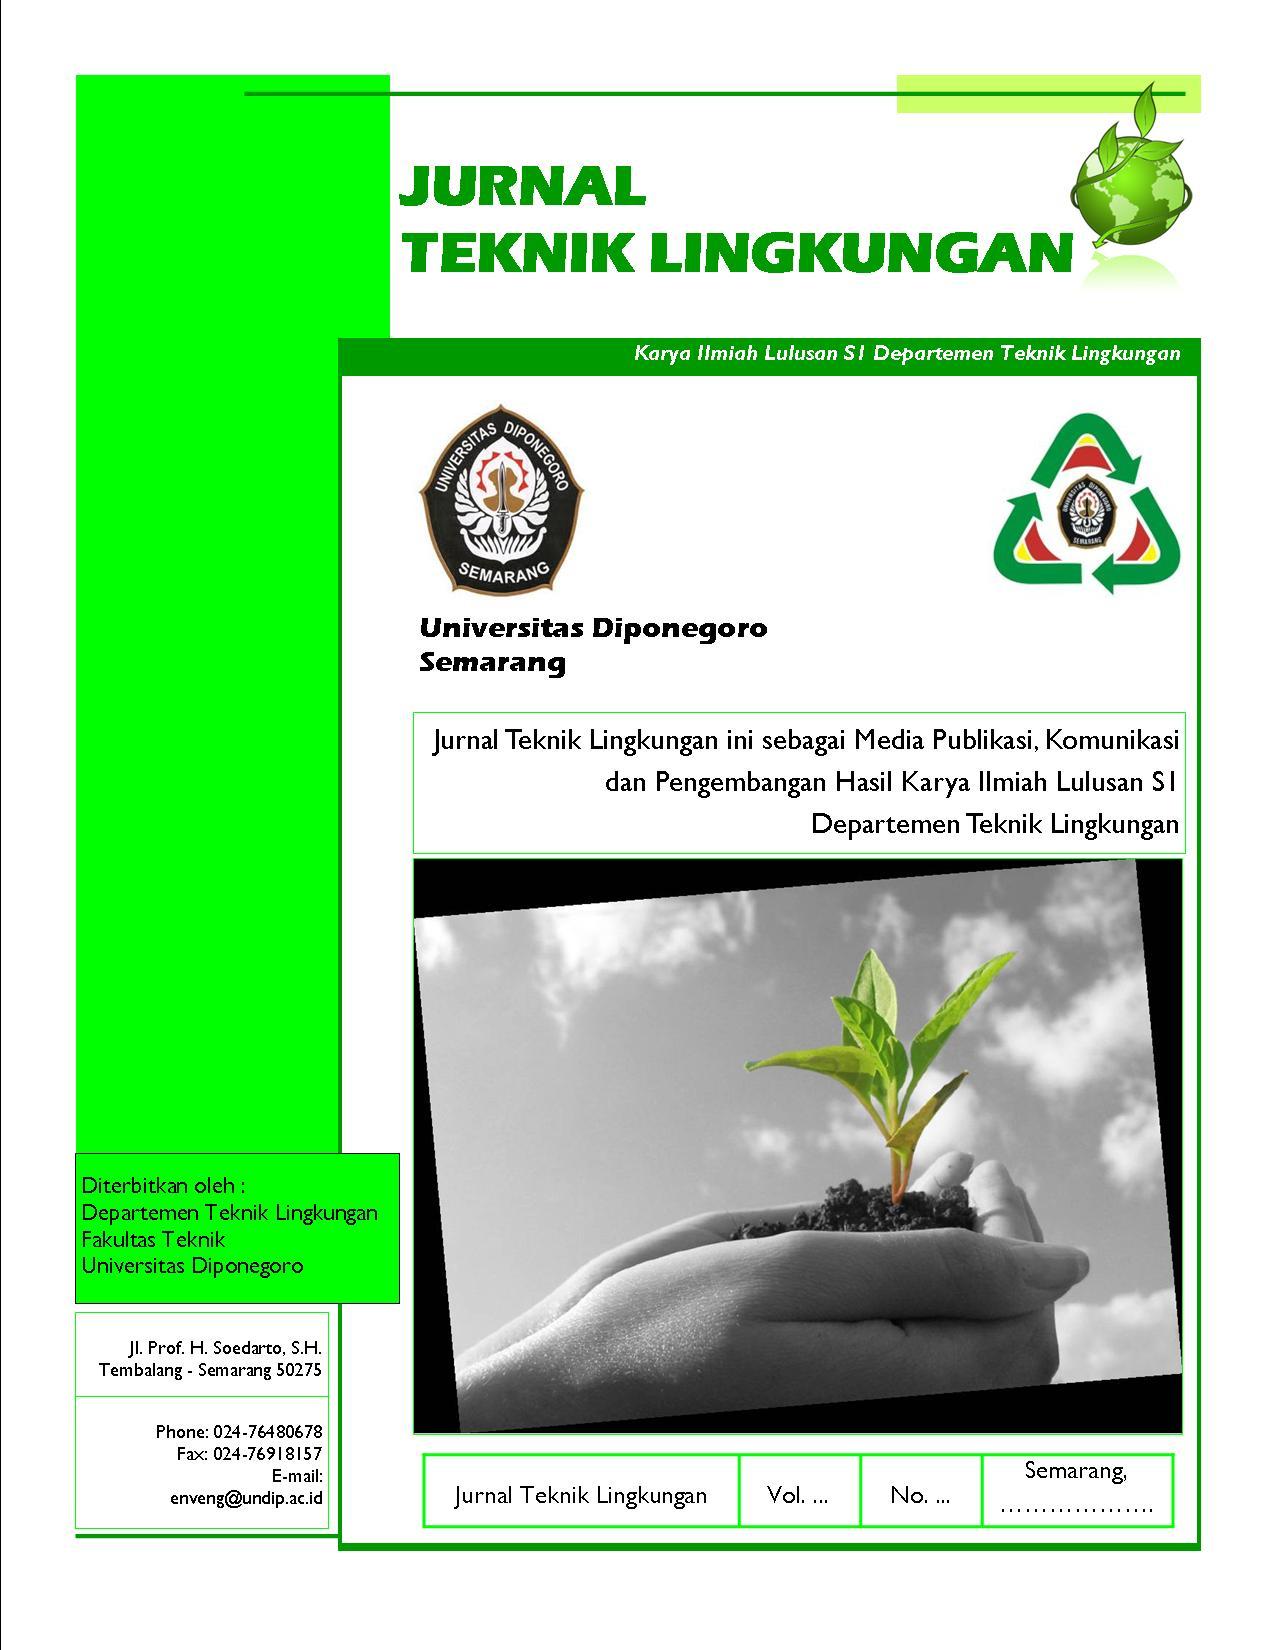 Jurnal Teknik Lingkungan